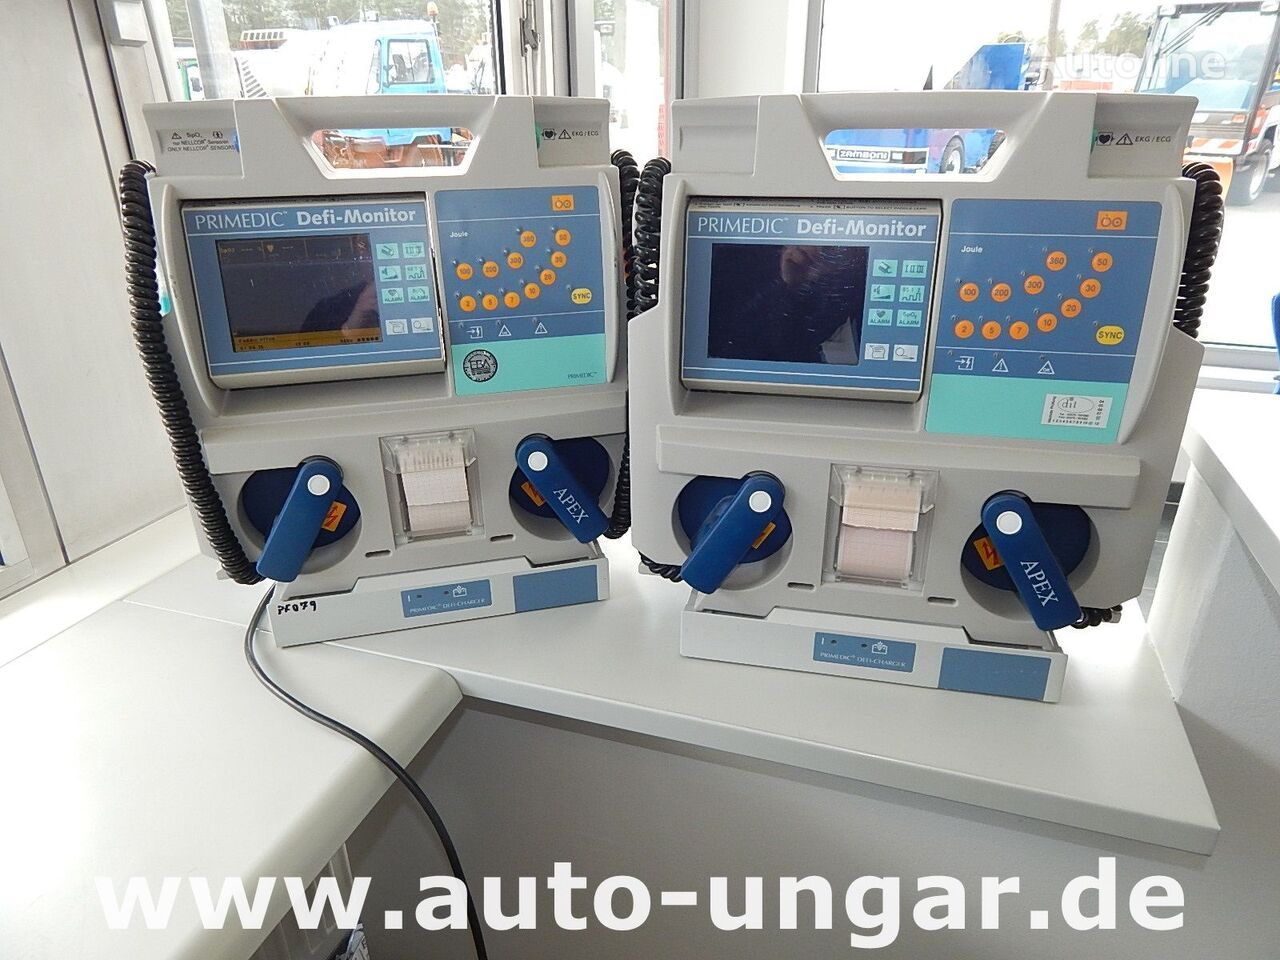 інше обладнання Primedic Defi-Monitor mit Ladestation - 2x auf Lager